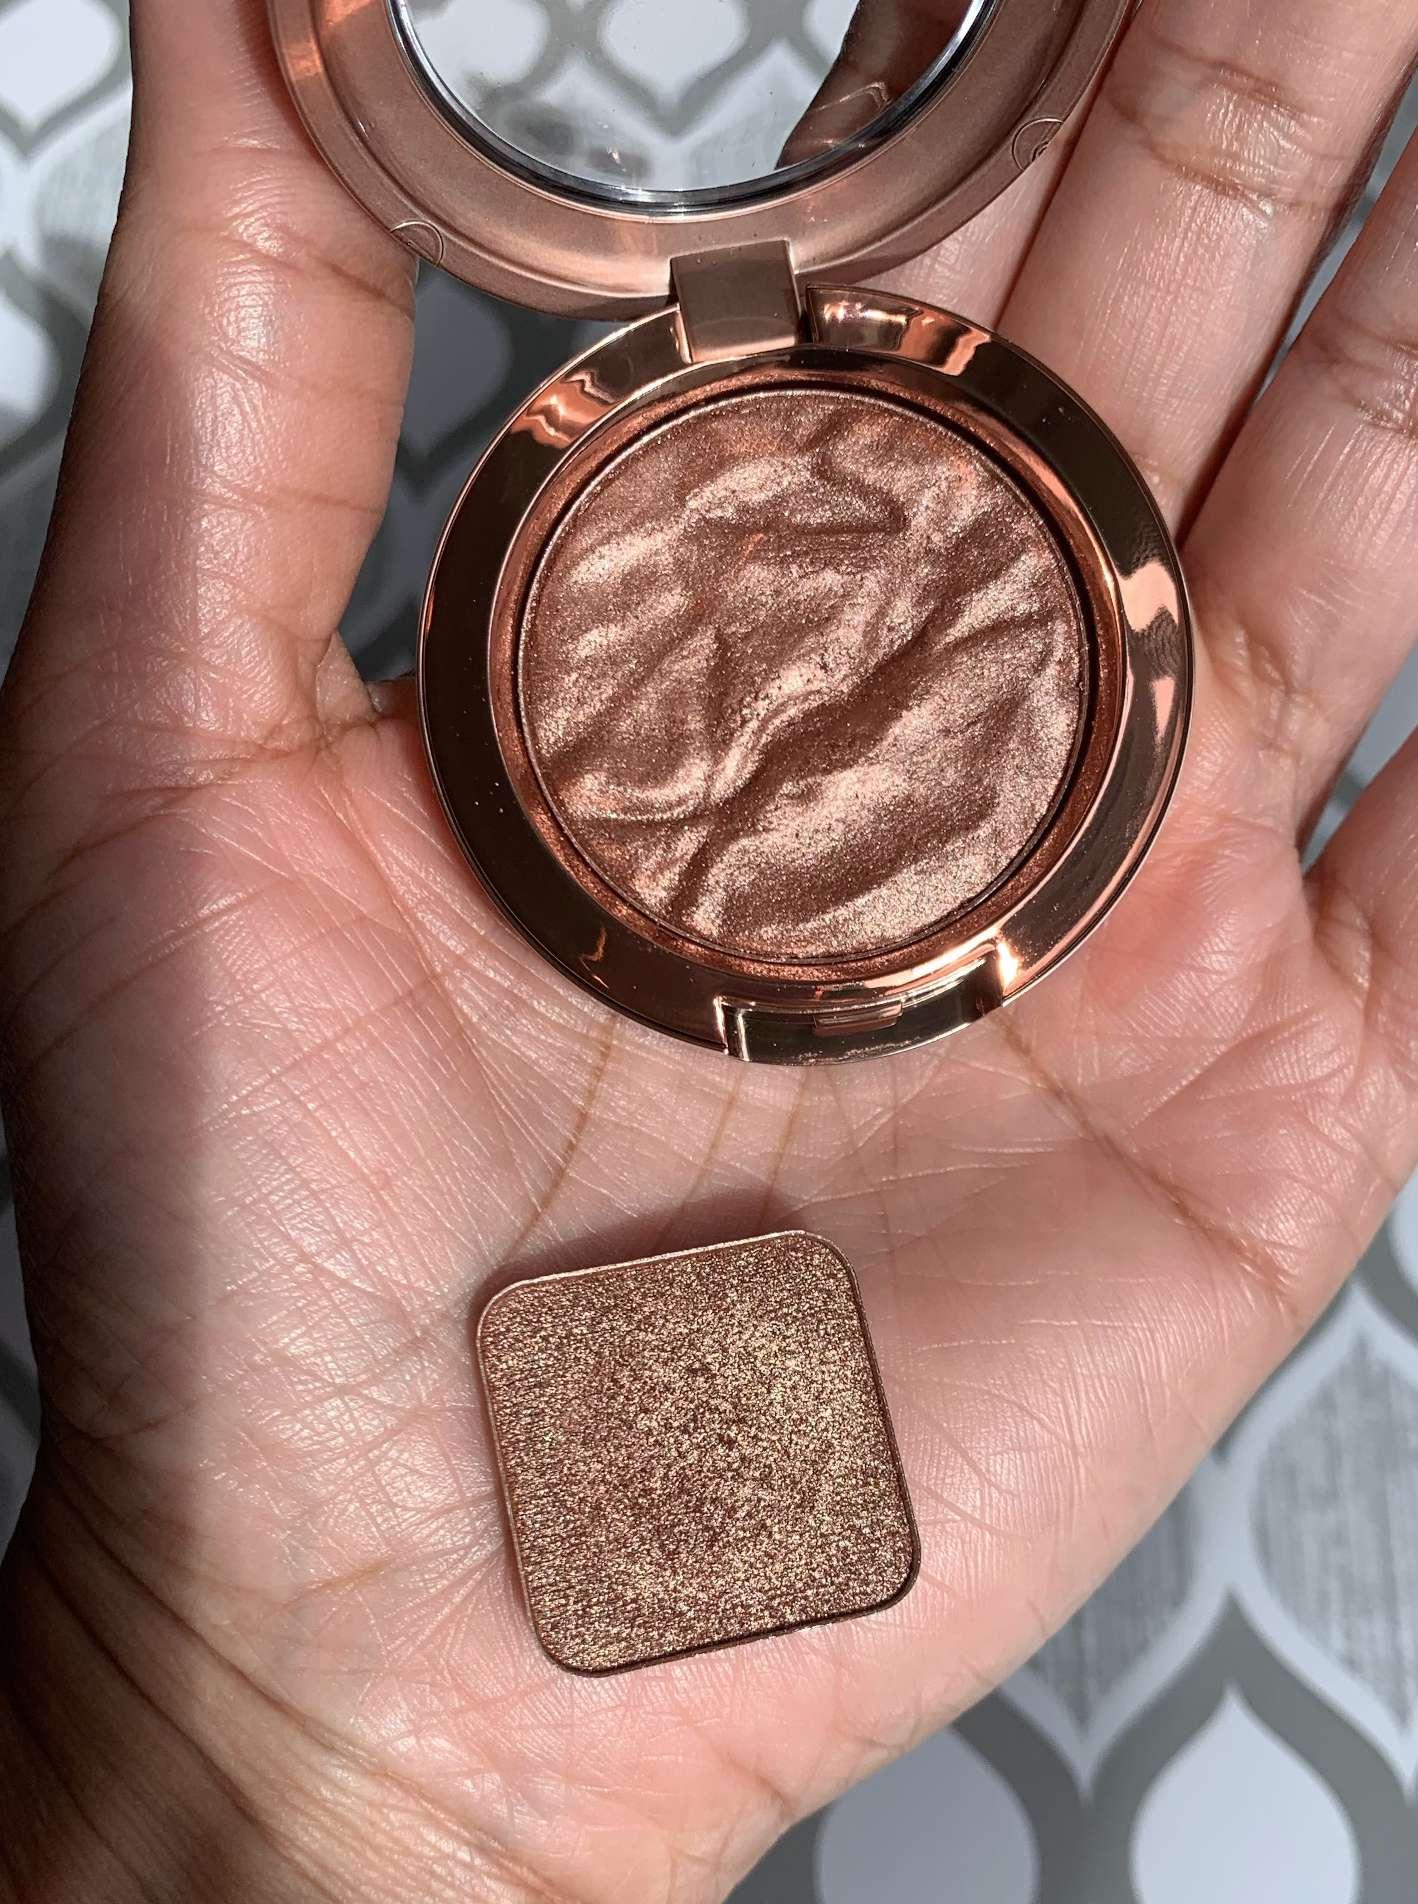 MAC Sand Tropez Foiled Eyeshadow vs Makeup Geek Grandstand Foiled Eyeshadow Swatches